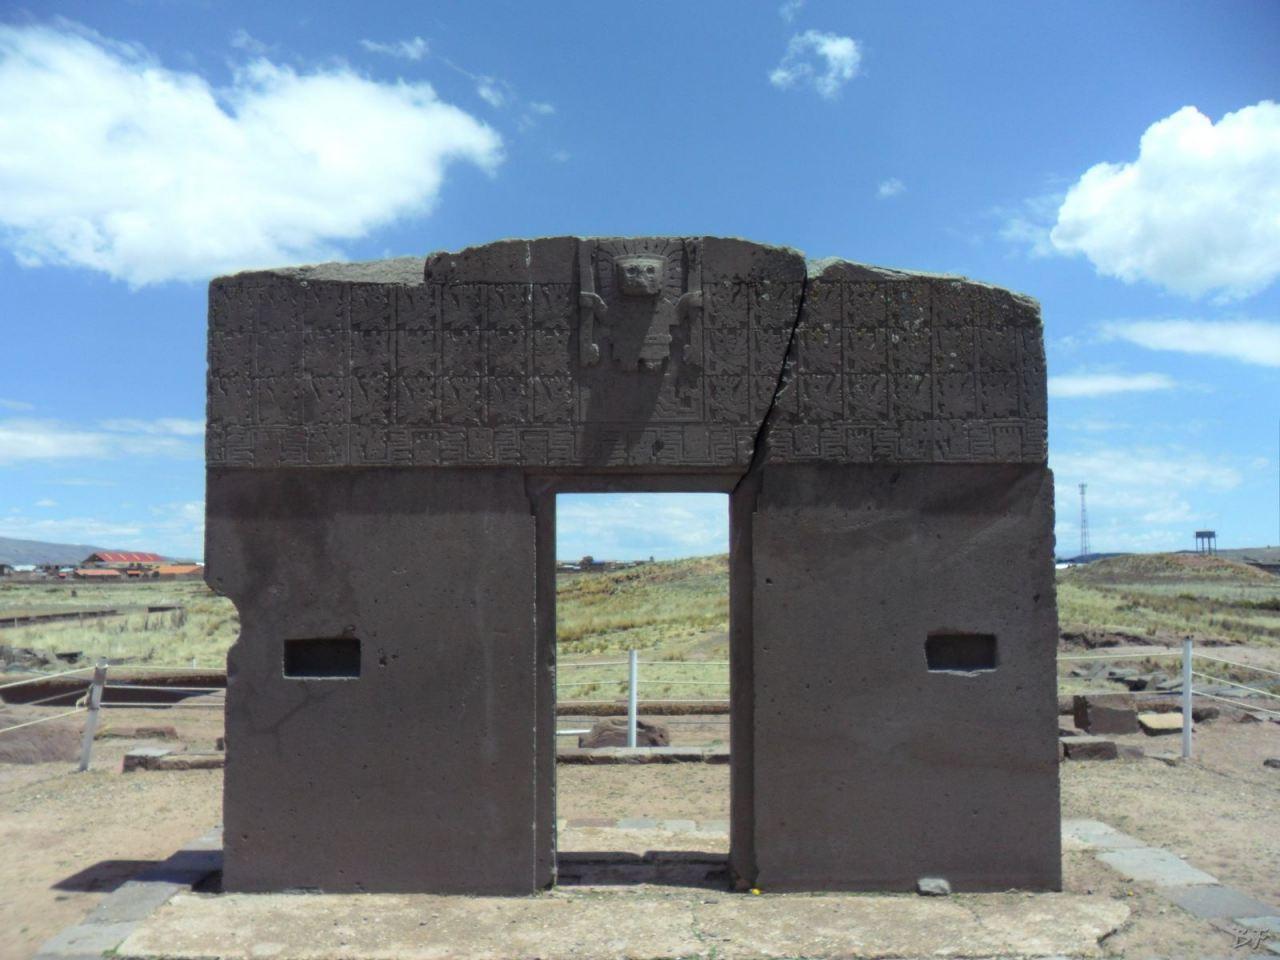 Sito-Megalitico-Piramide-Akapana-Kalasasaya-Menhir-Tiahuanaco-Bolivia-27